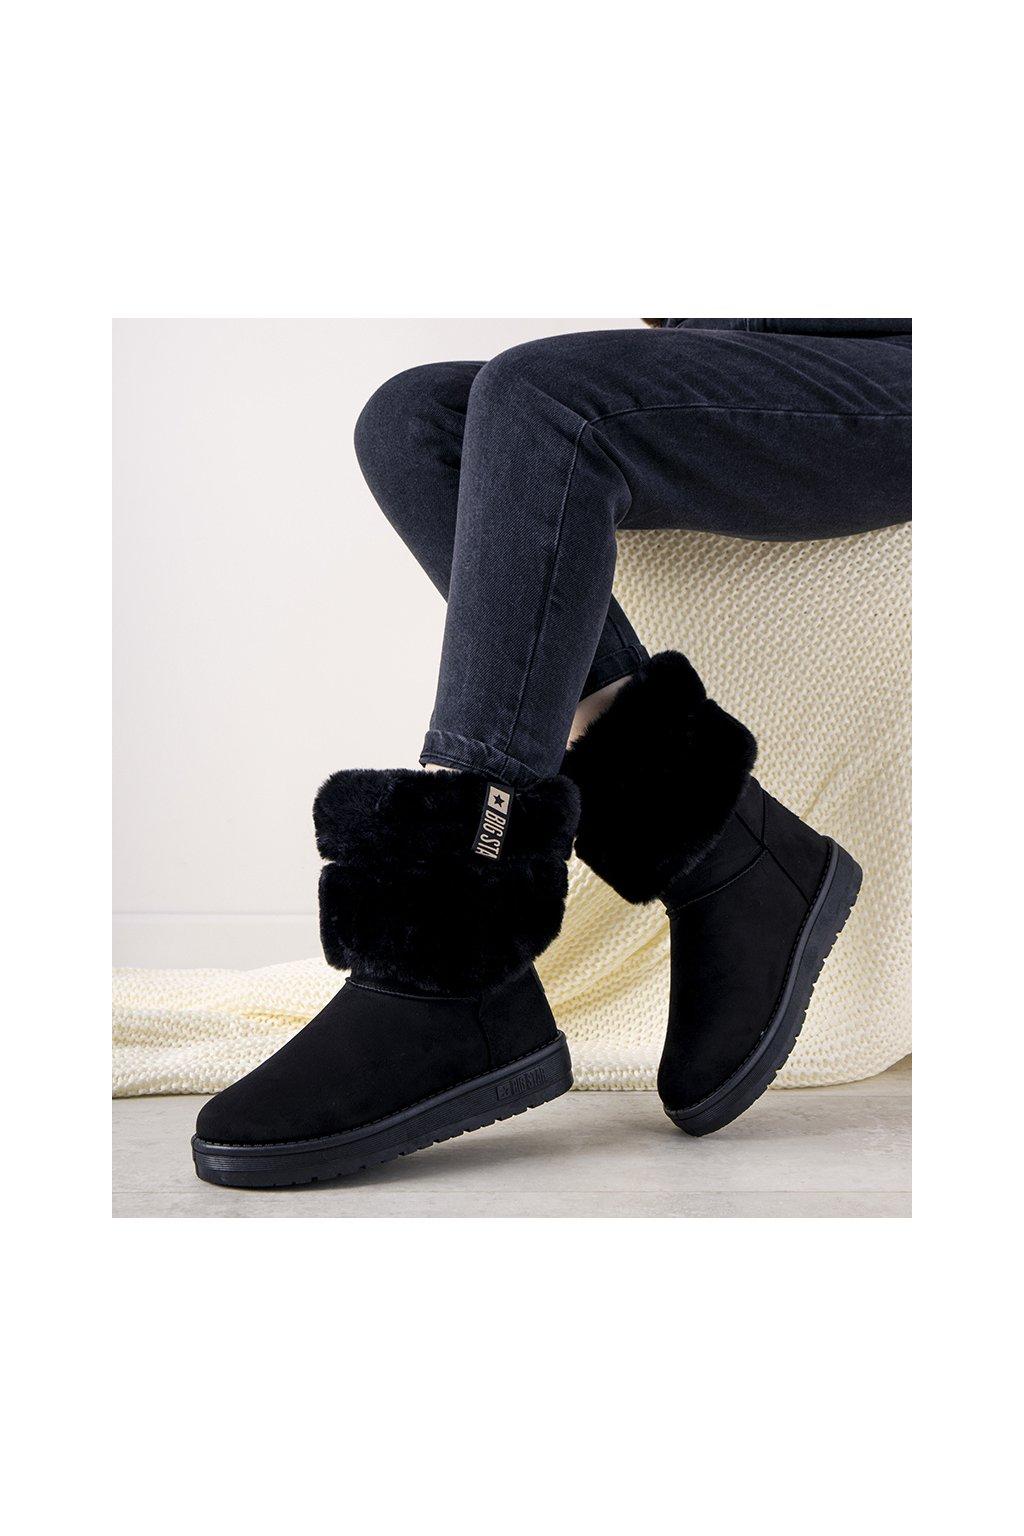 Dámske topánky BS čierne kód II274123 - GM